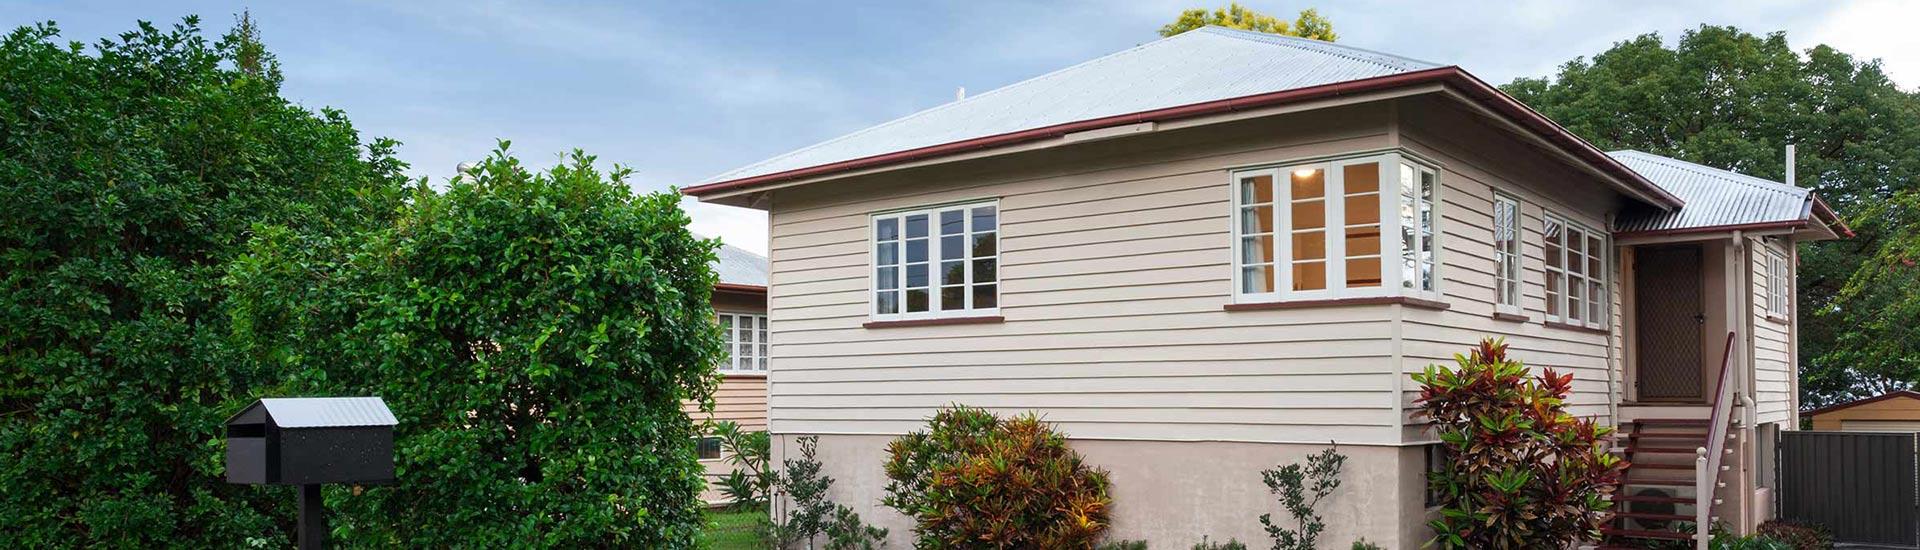 bernies trades modern australian residential building